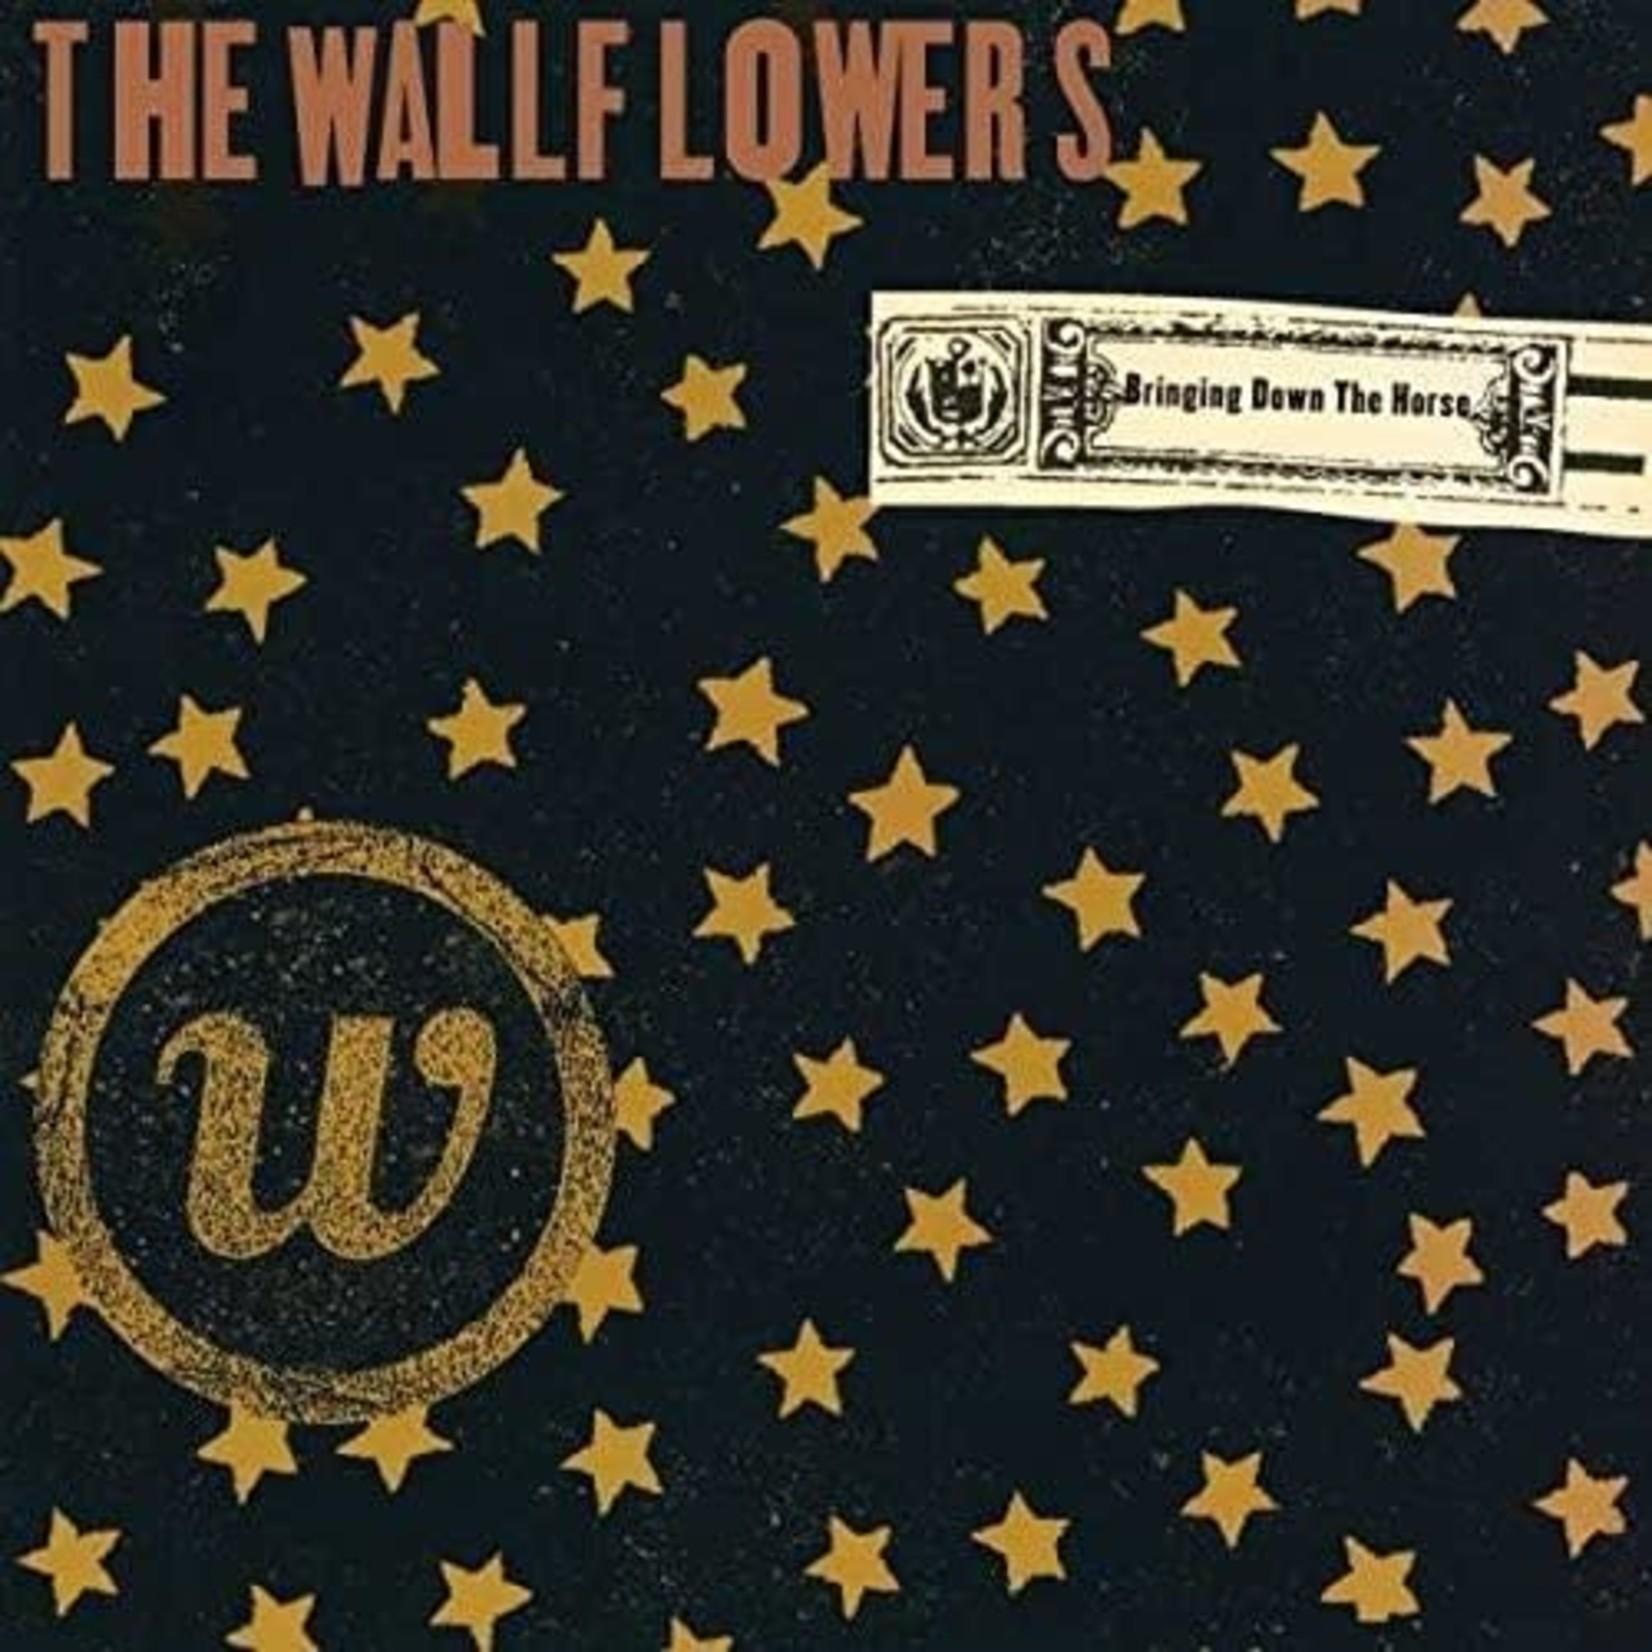 Vinyl The Wallflowers - Bringing Down The Horse (2LP)